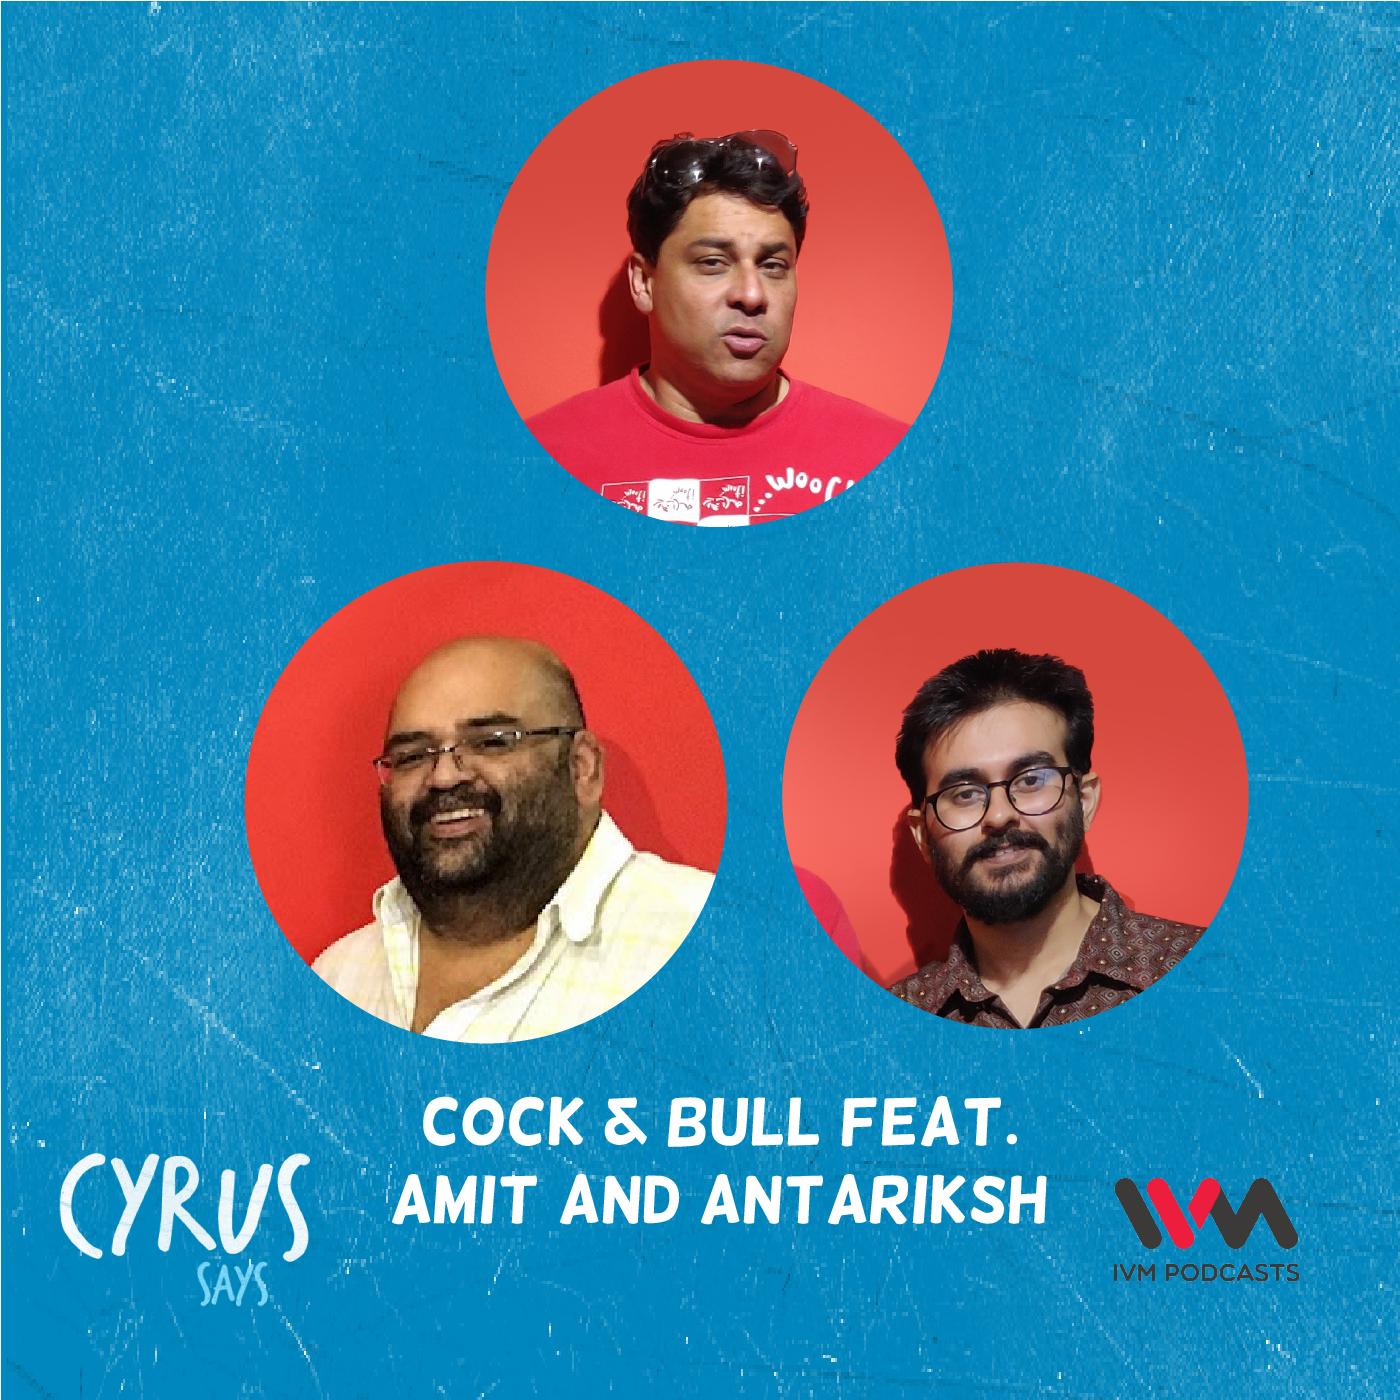 Ep. 633: Cock & Bull feat. Amit and Antariksh